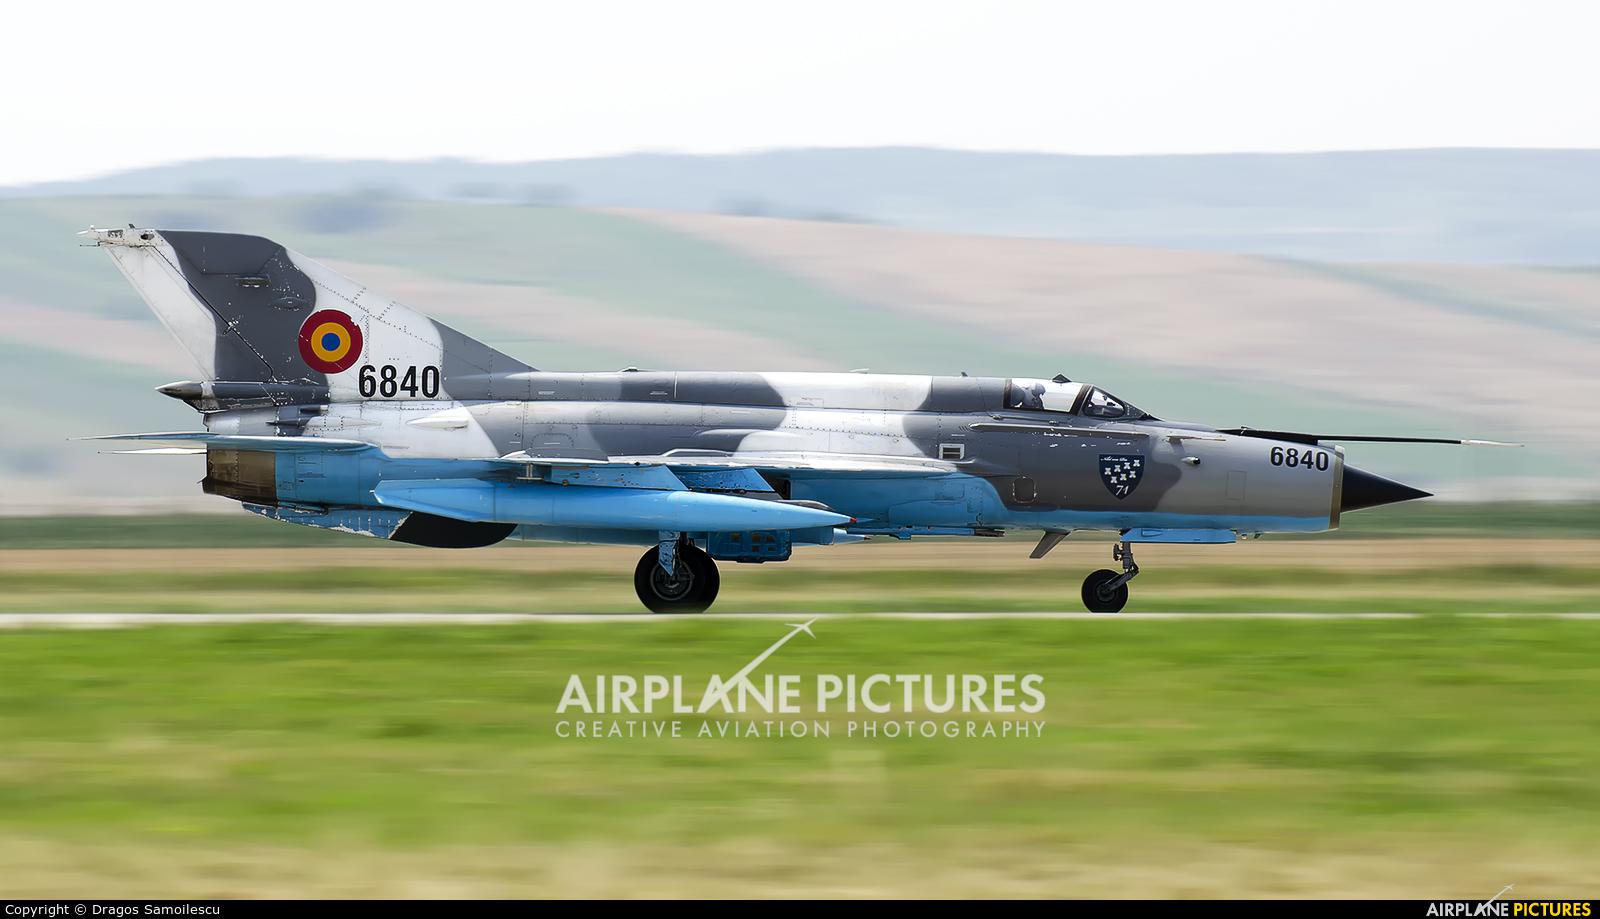 Romania - Air Force 6840 aircraft at Câmpia Turzii